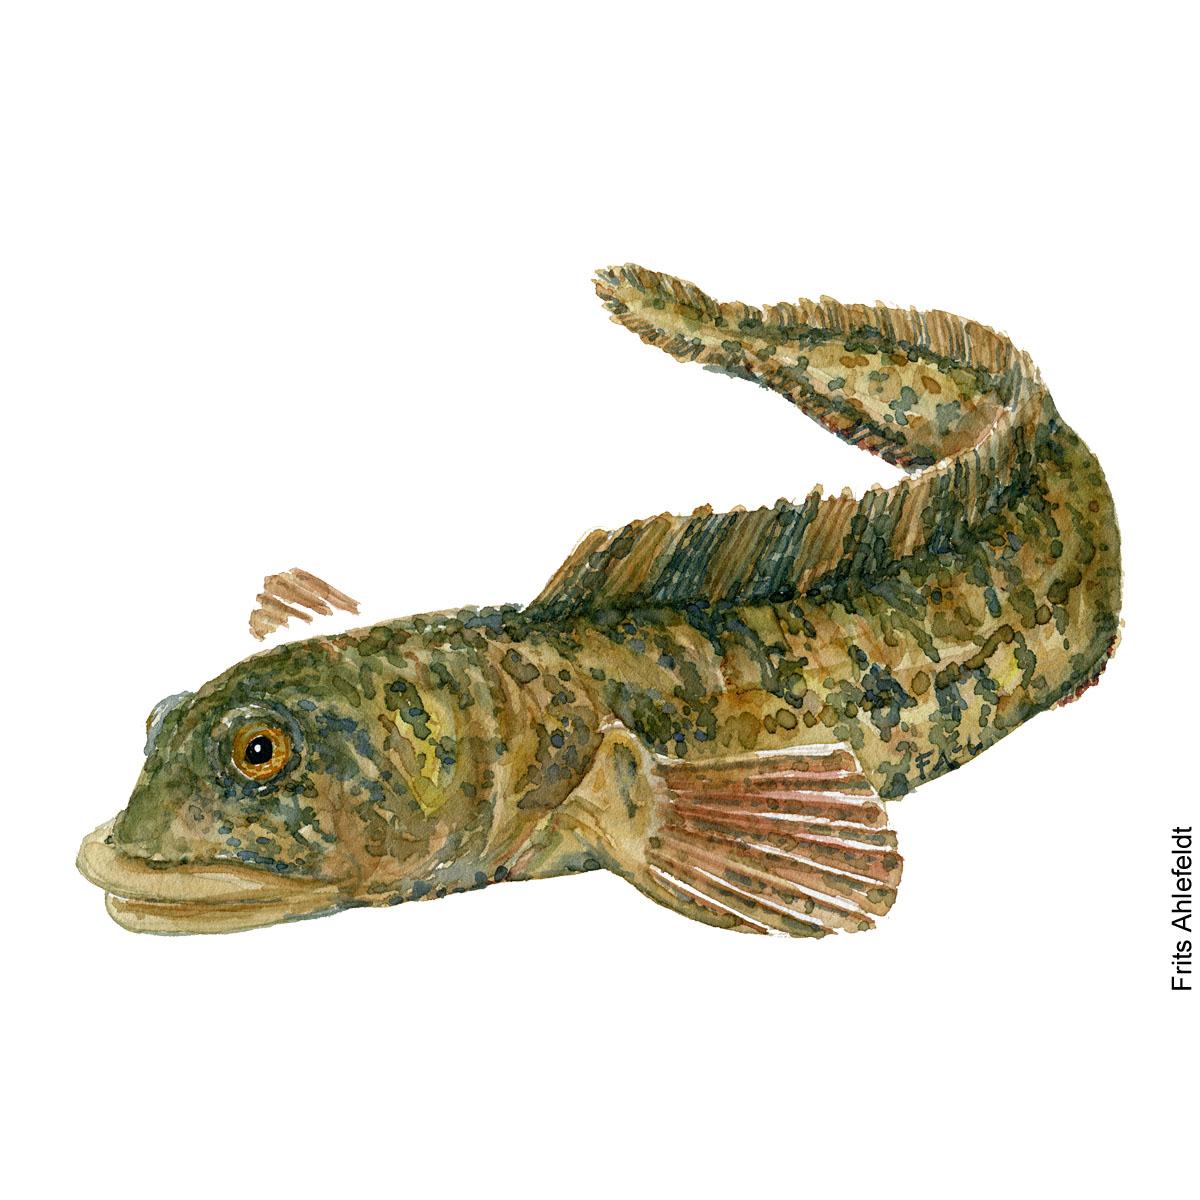 Aalekvabbe - Eelpout - Fish watercolor painting by Frits Ahlefeldt, Akvarel af Frits Ahlefeldt